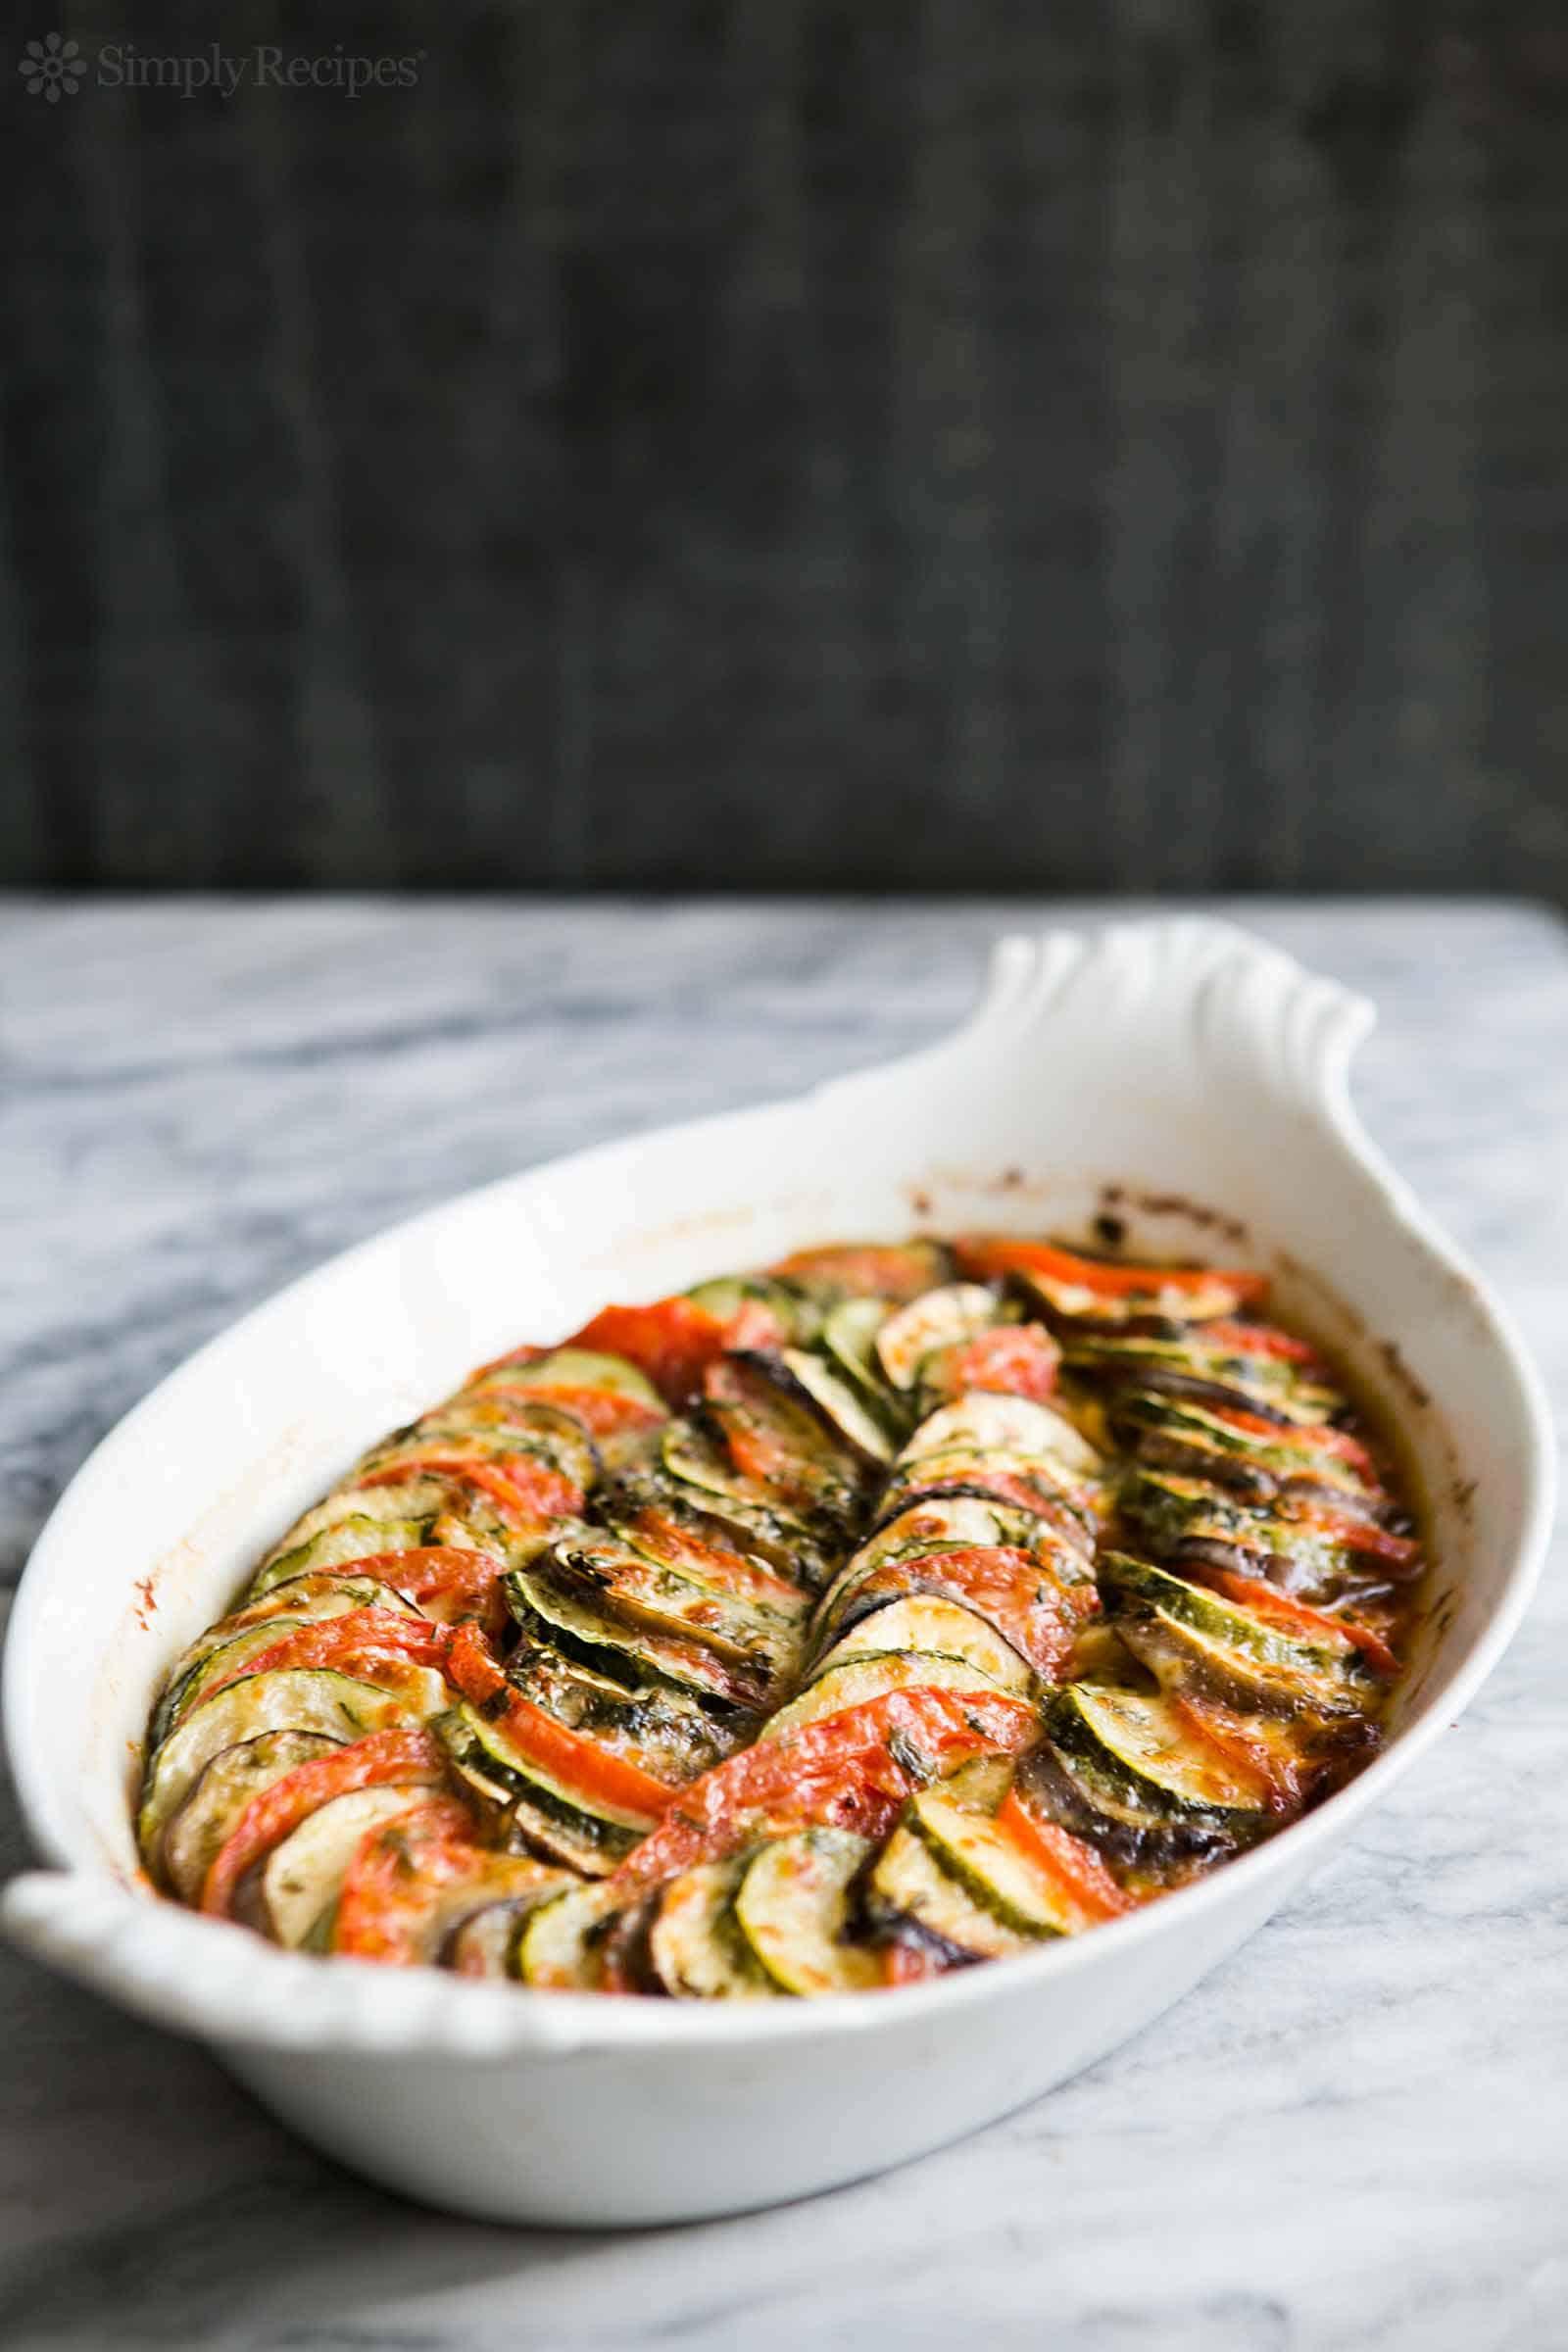 Zucchini, eggplant, and tomato gratin